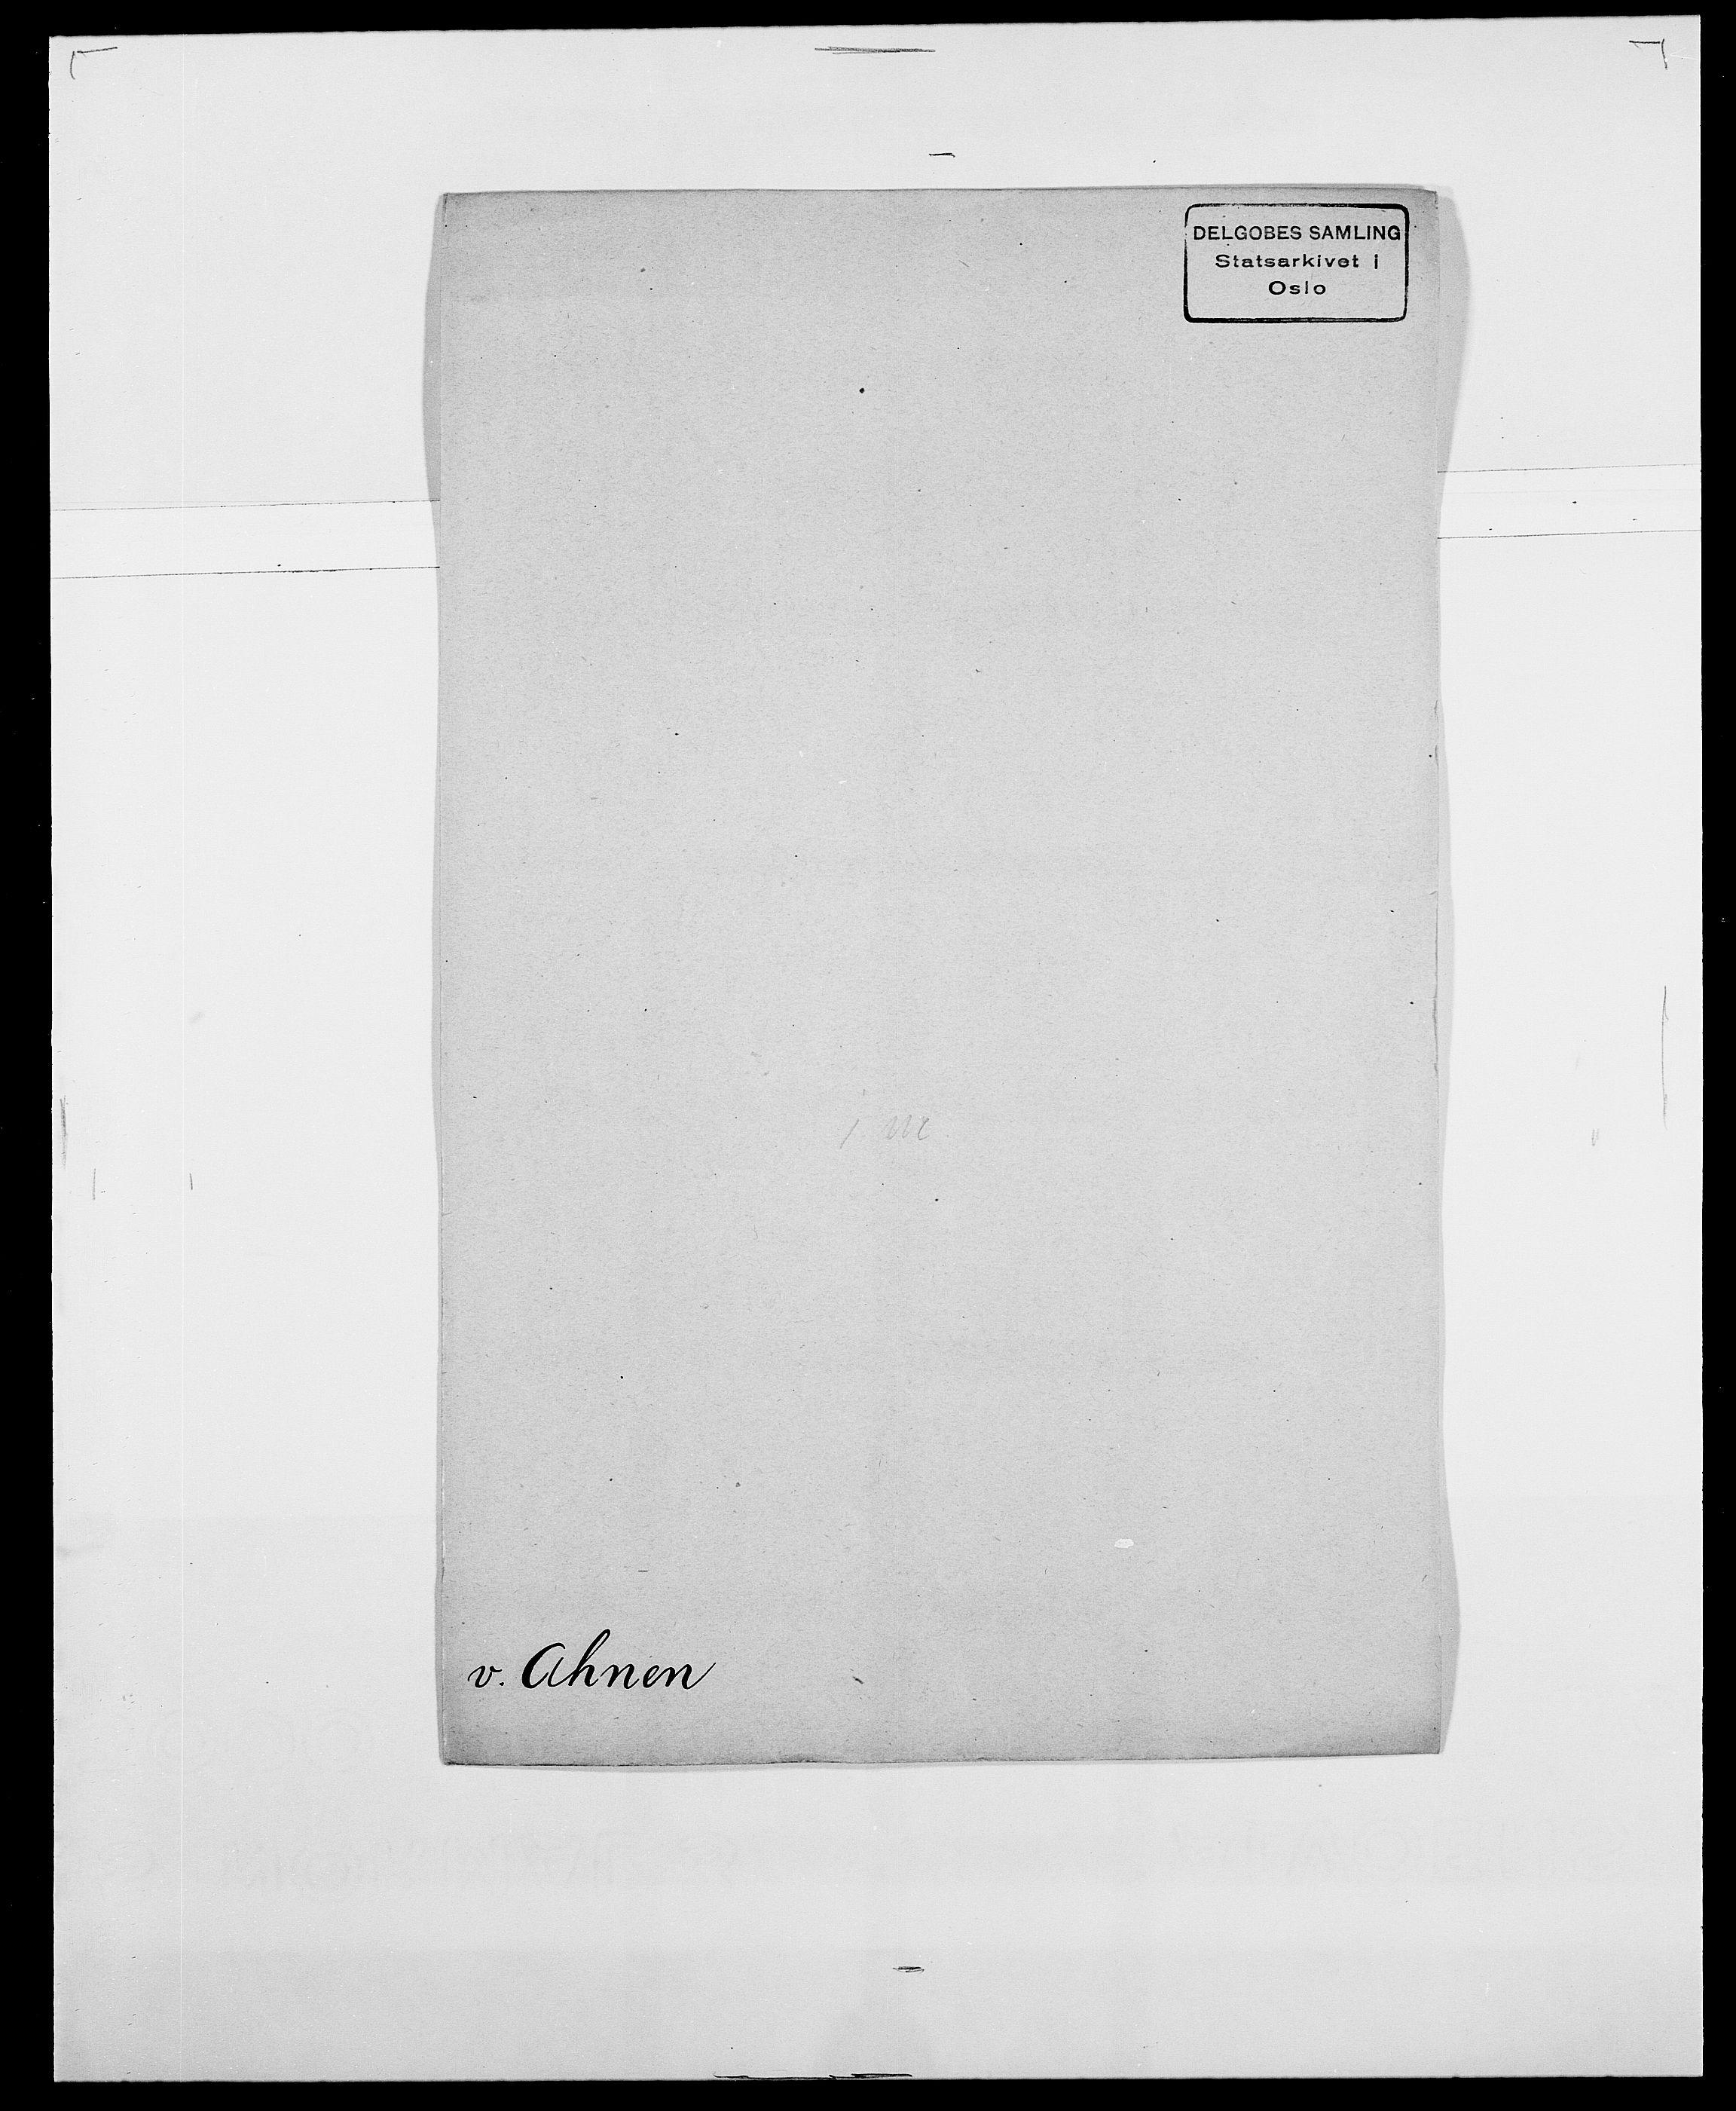 SAO, Delgobe, Charles Antoine - samling, D/Da/L0001: Aabye - Angerman, s. 343